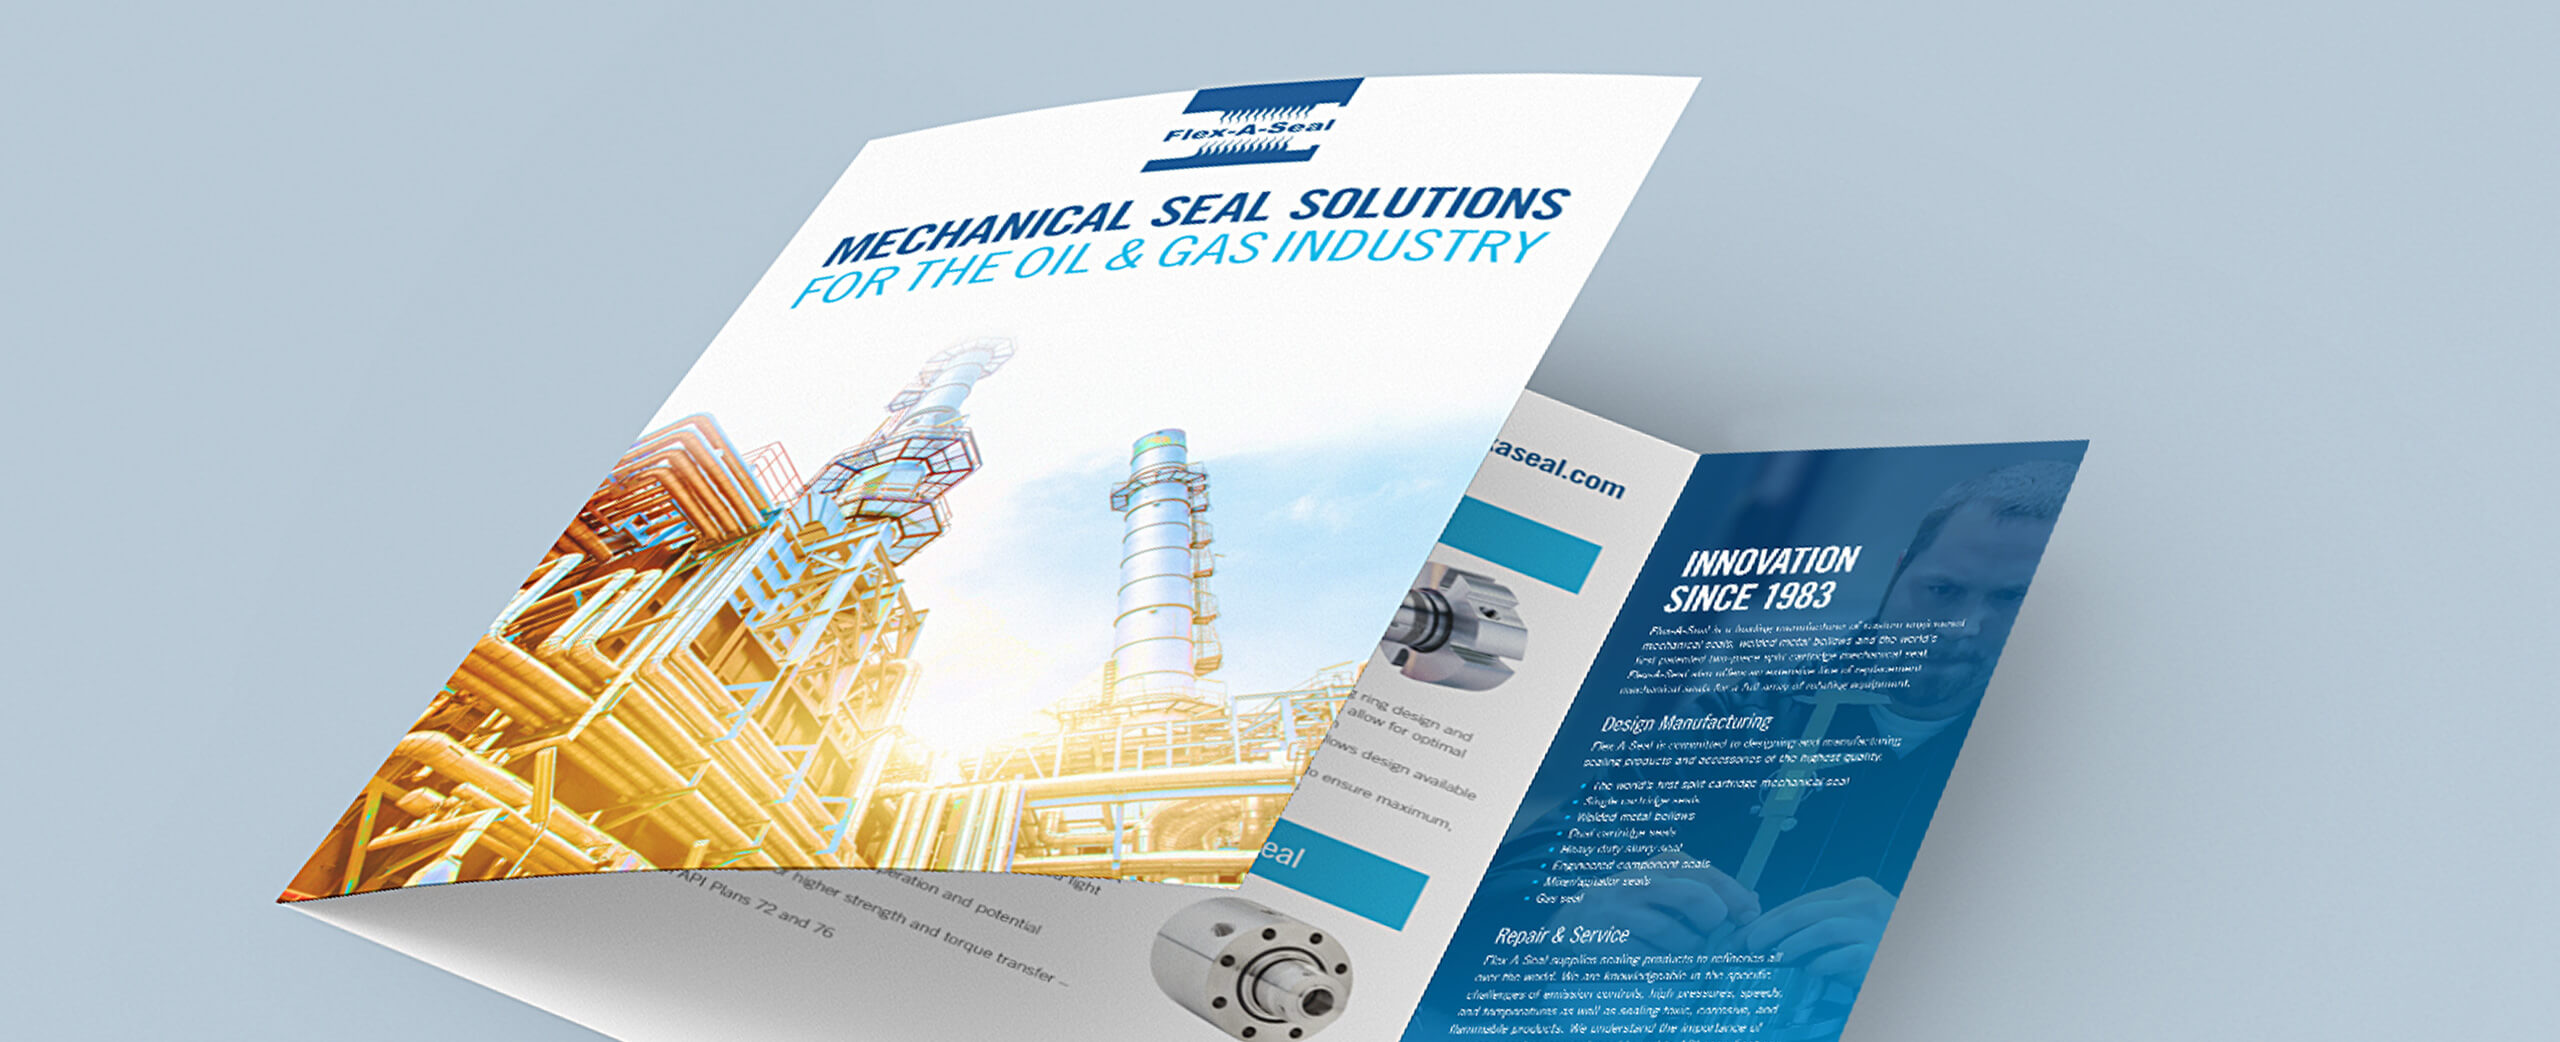 dmg-marketing-collateral-flex-a-seal-brochure